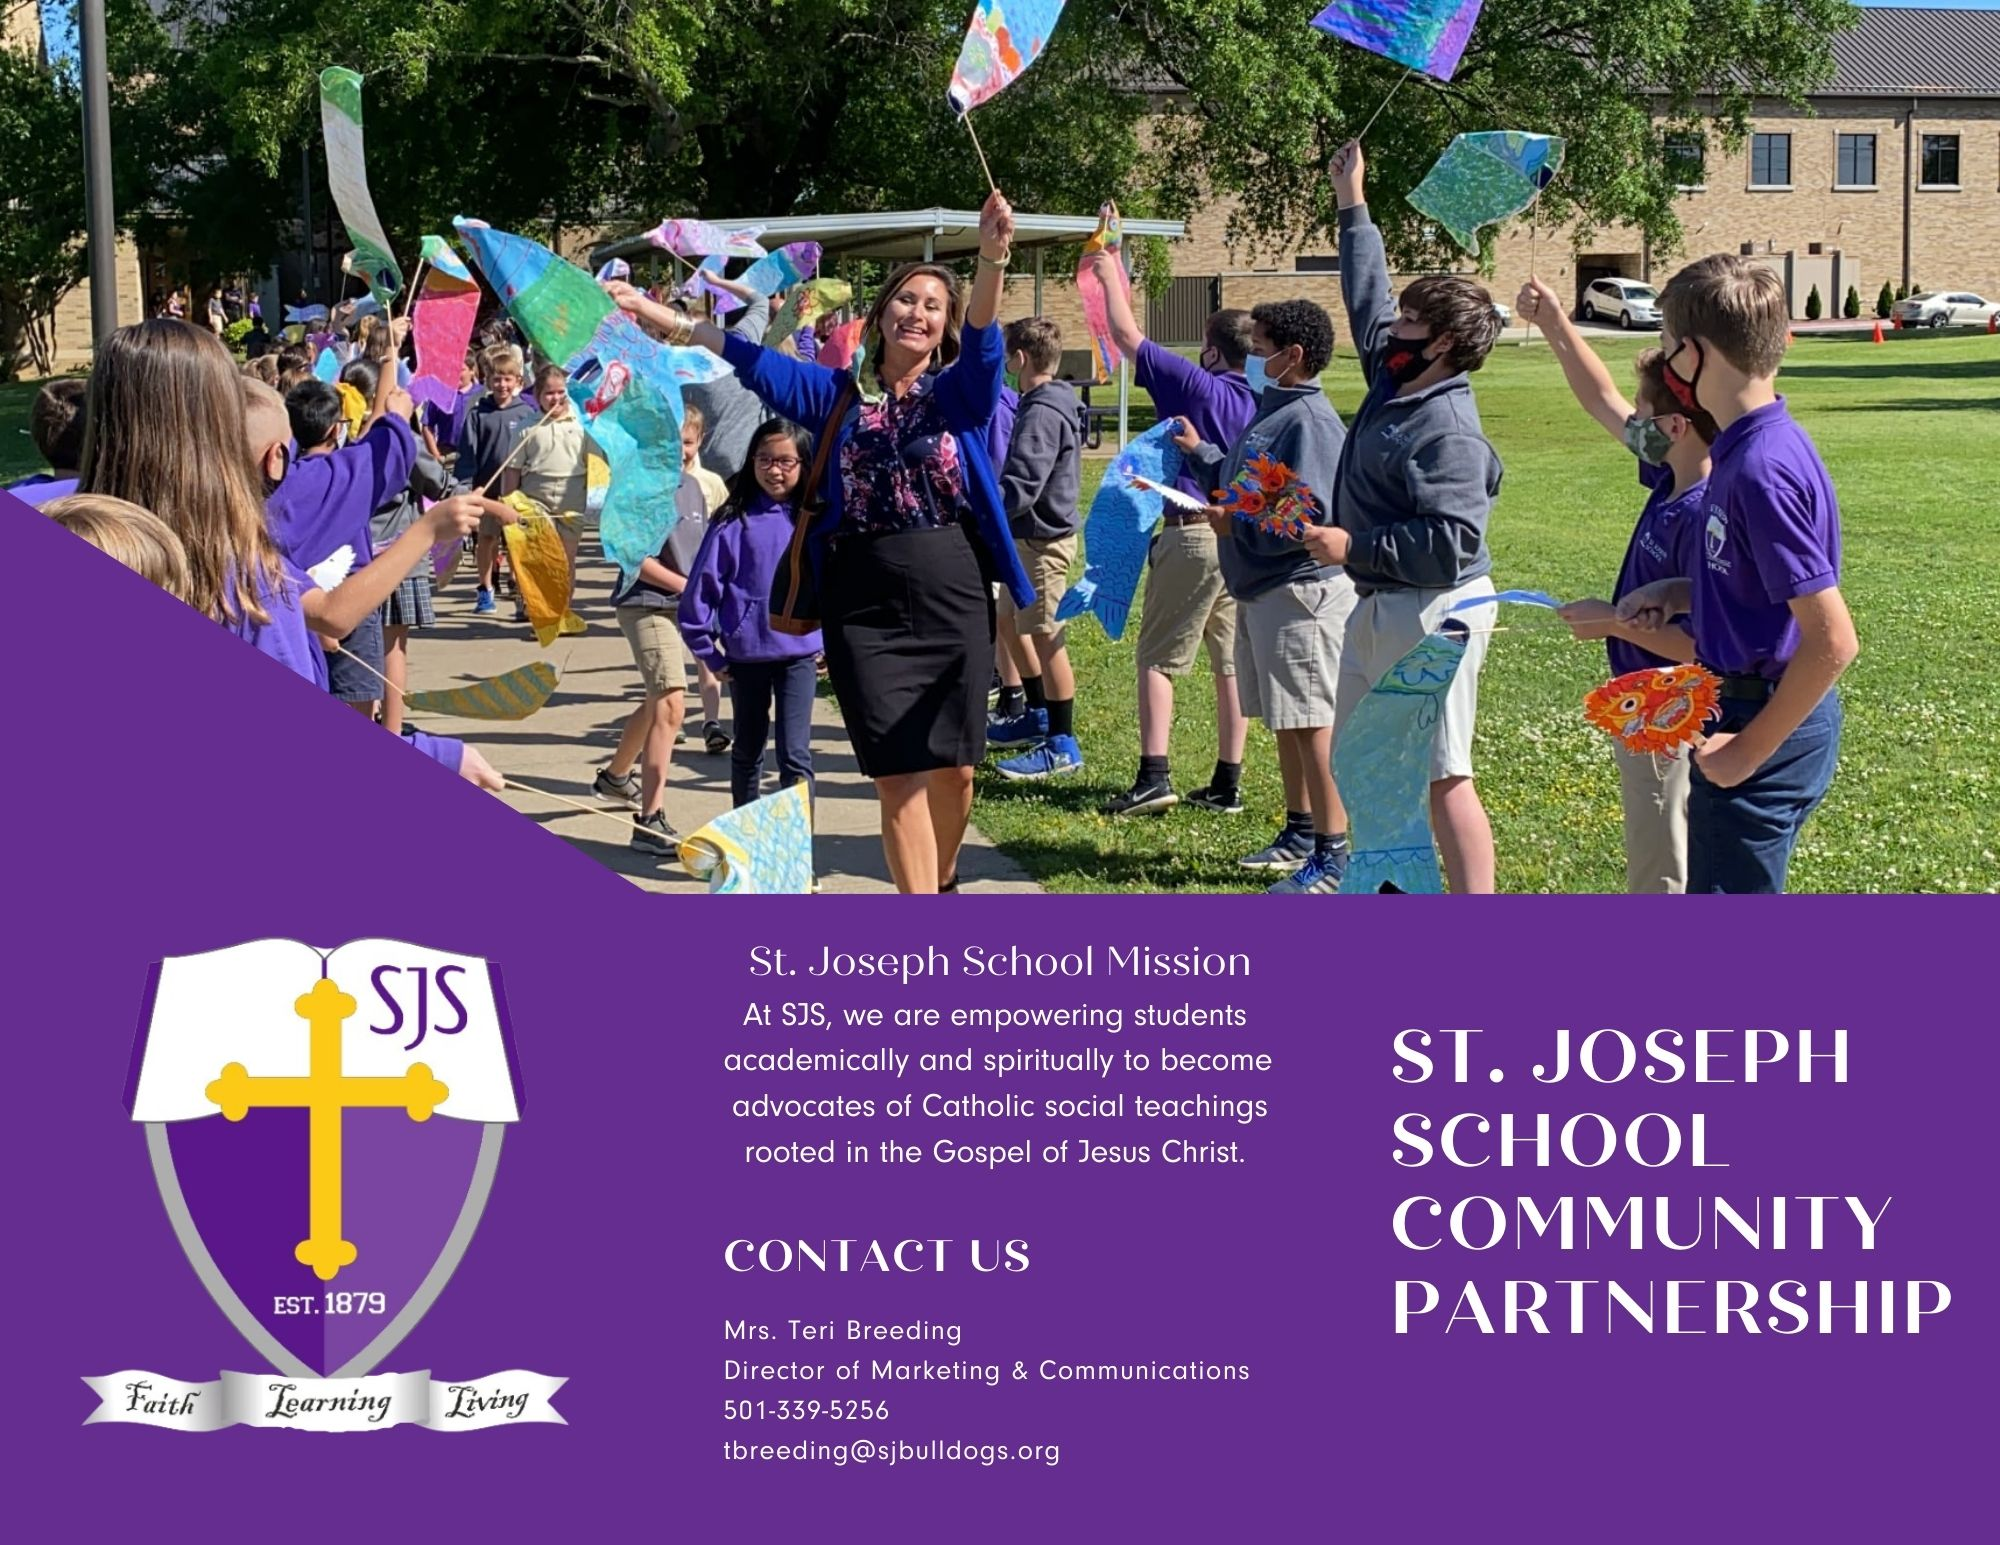 photo that says st. joseph school community partnership program